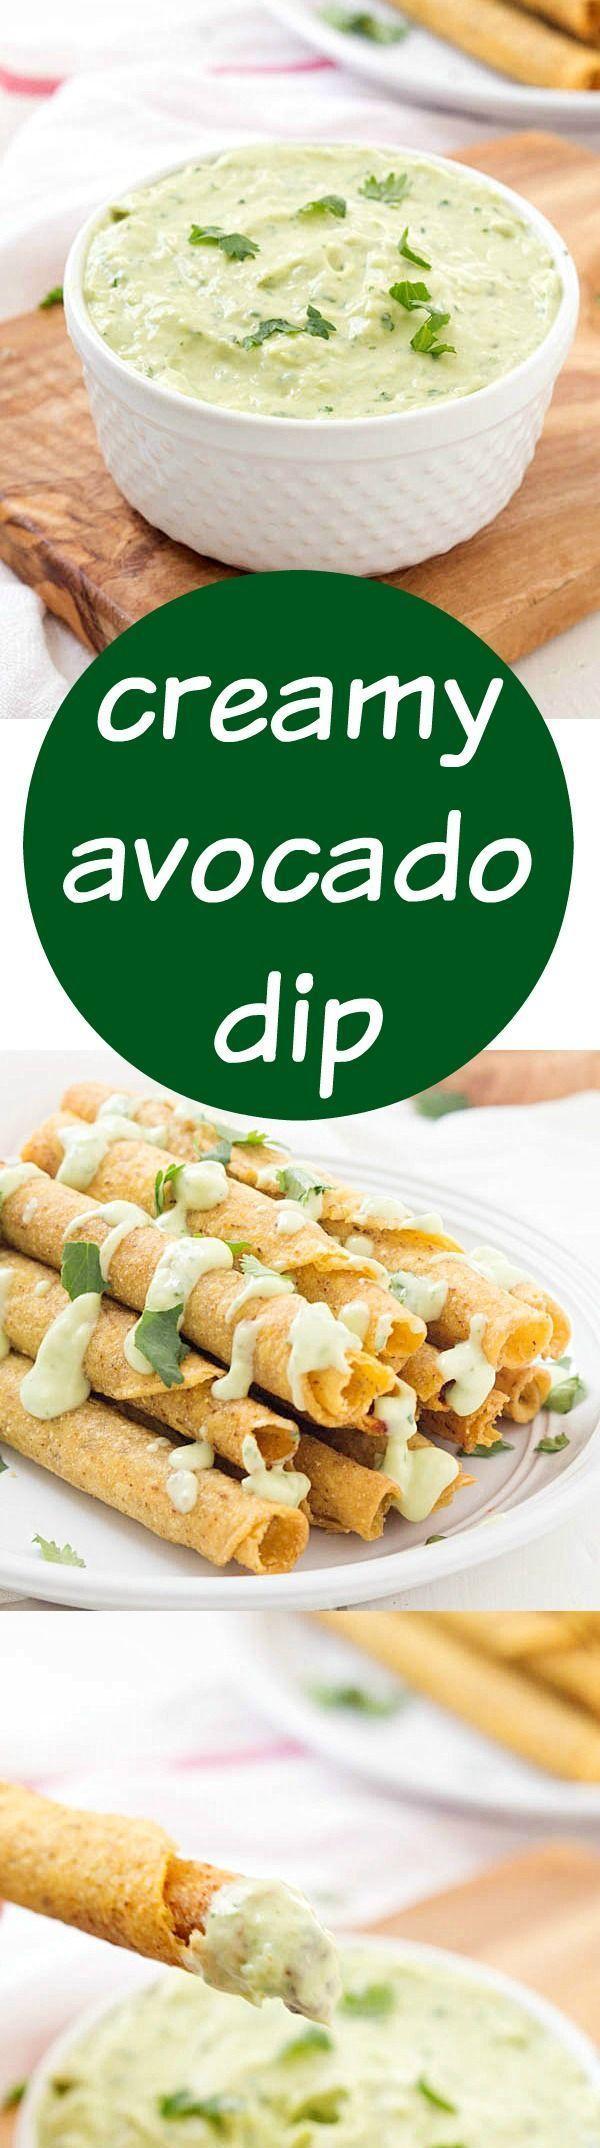 Best 25+ Avocado Dip ideas on Pinterest | Healthy dip ...